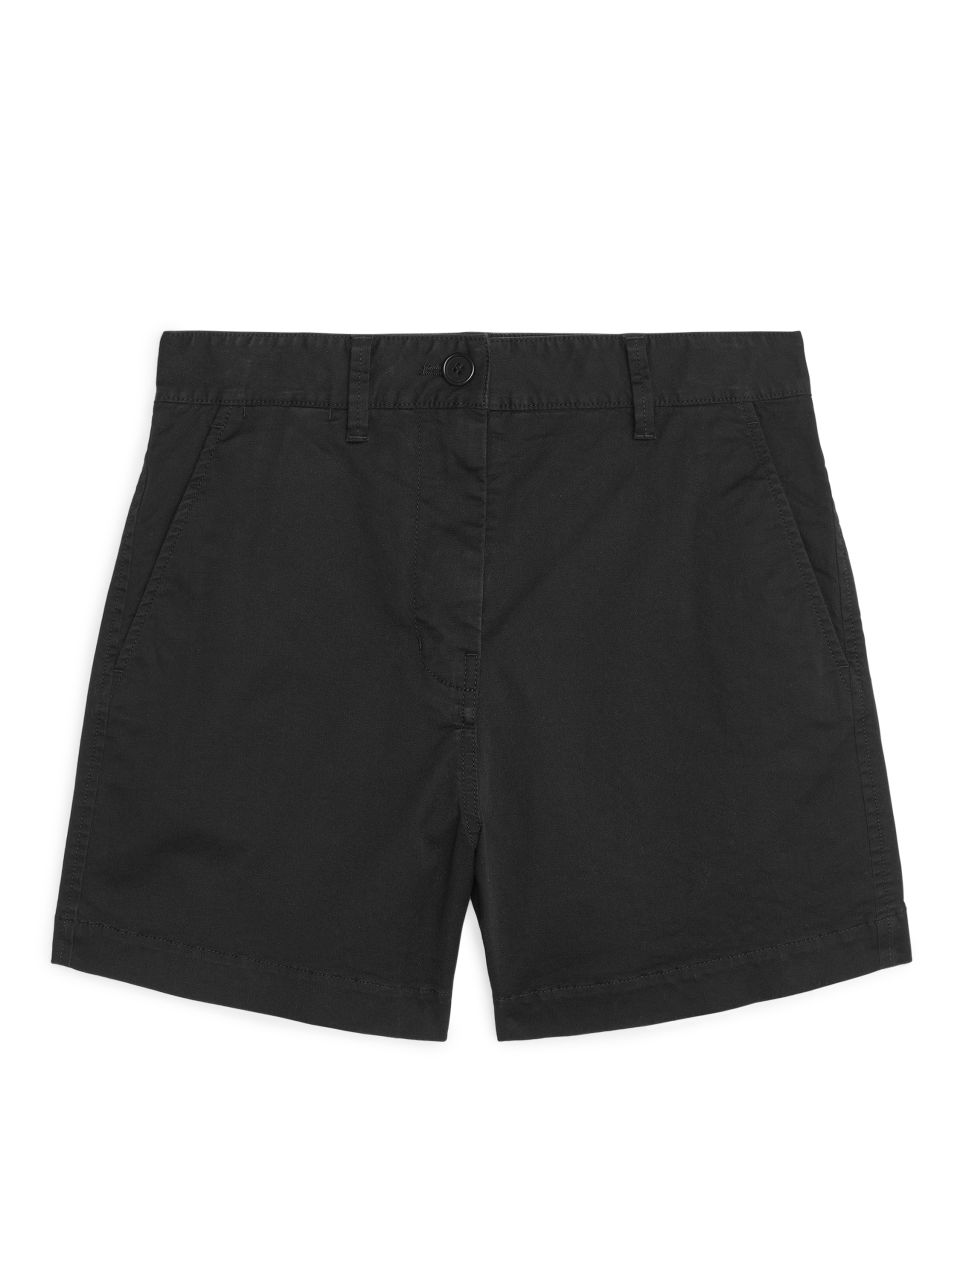 Twill Chino Shorts - Black